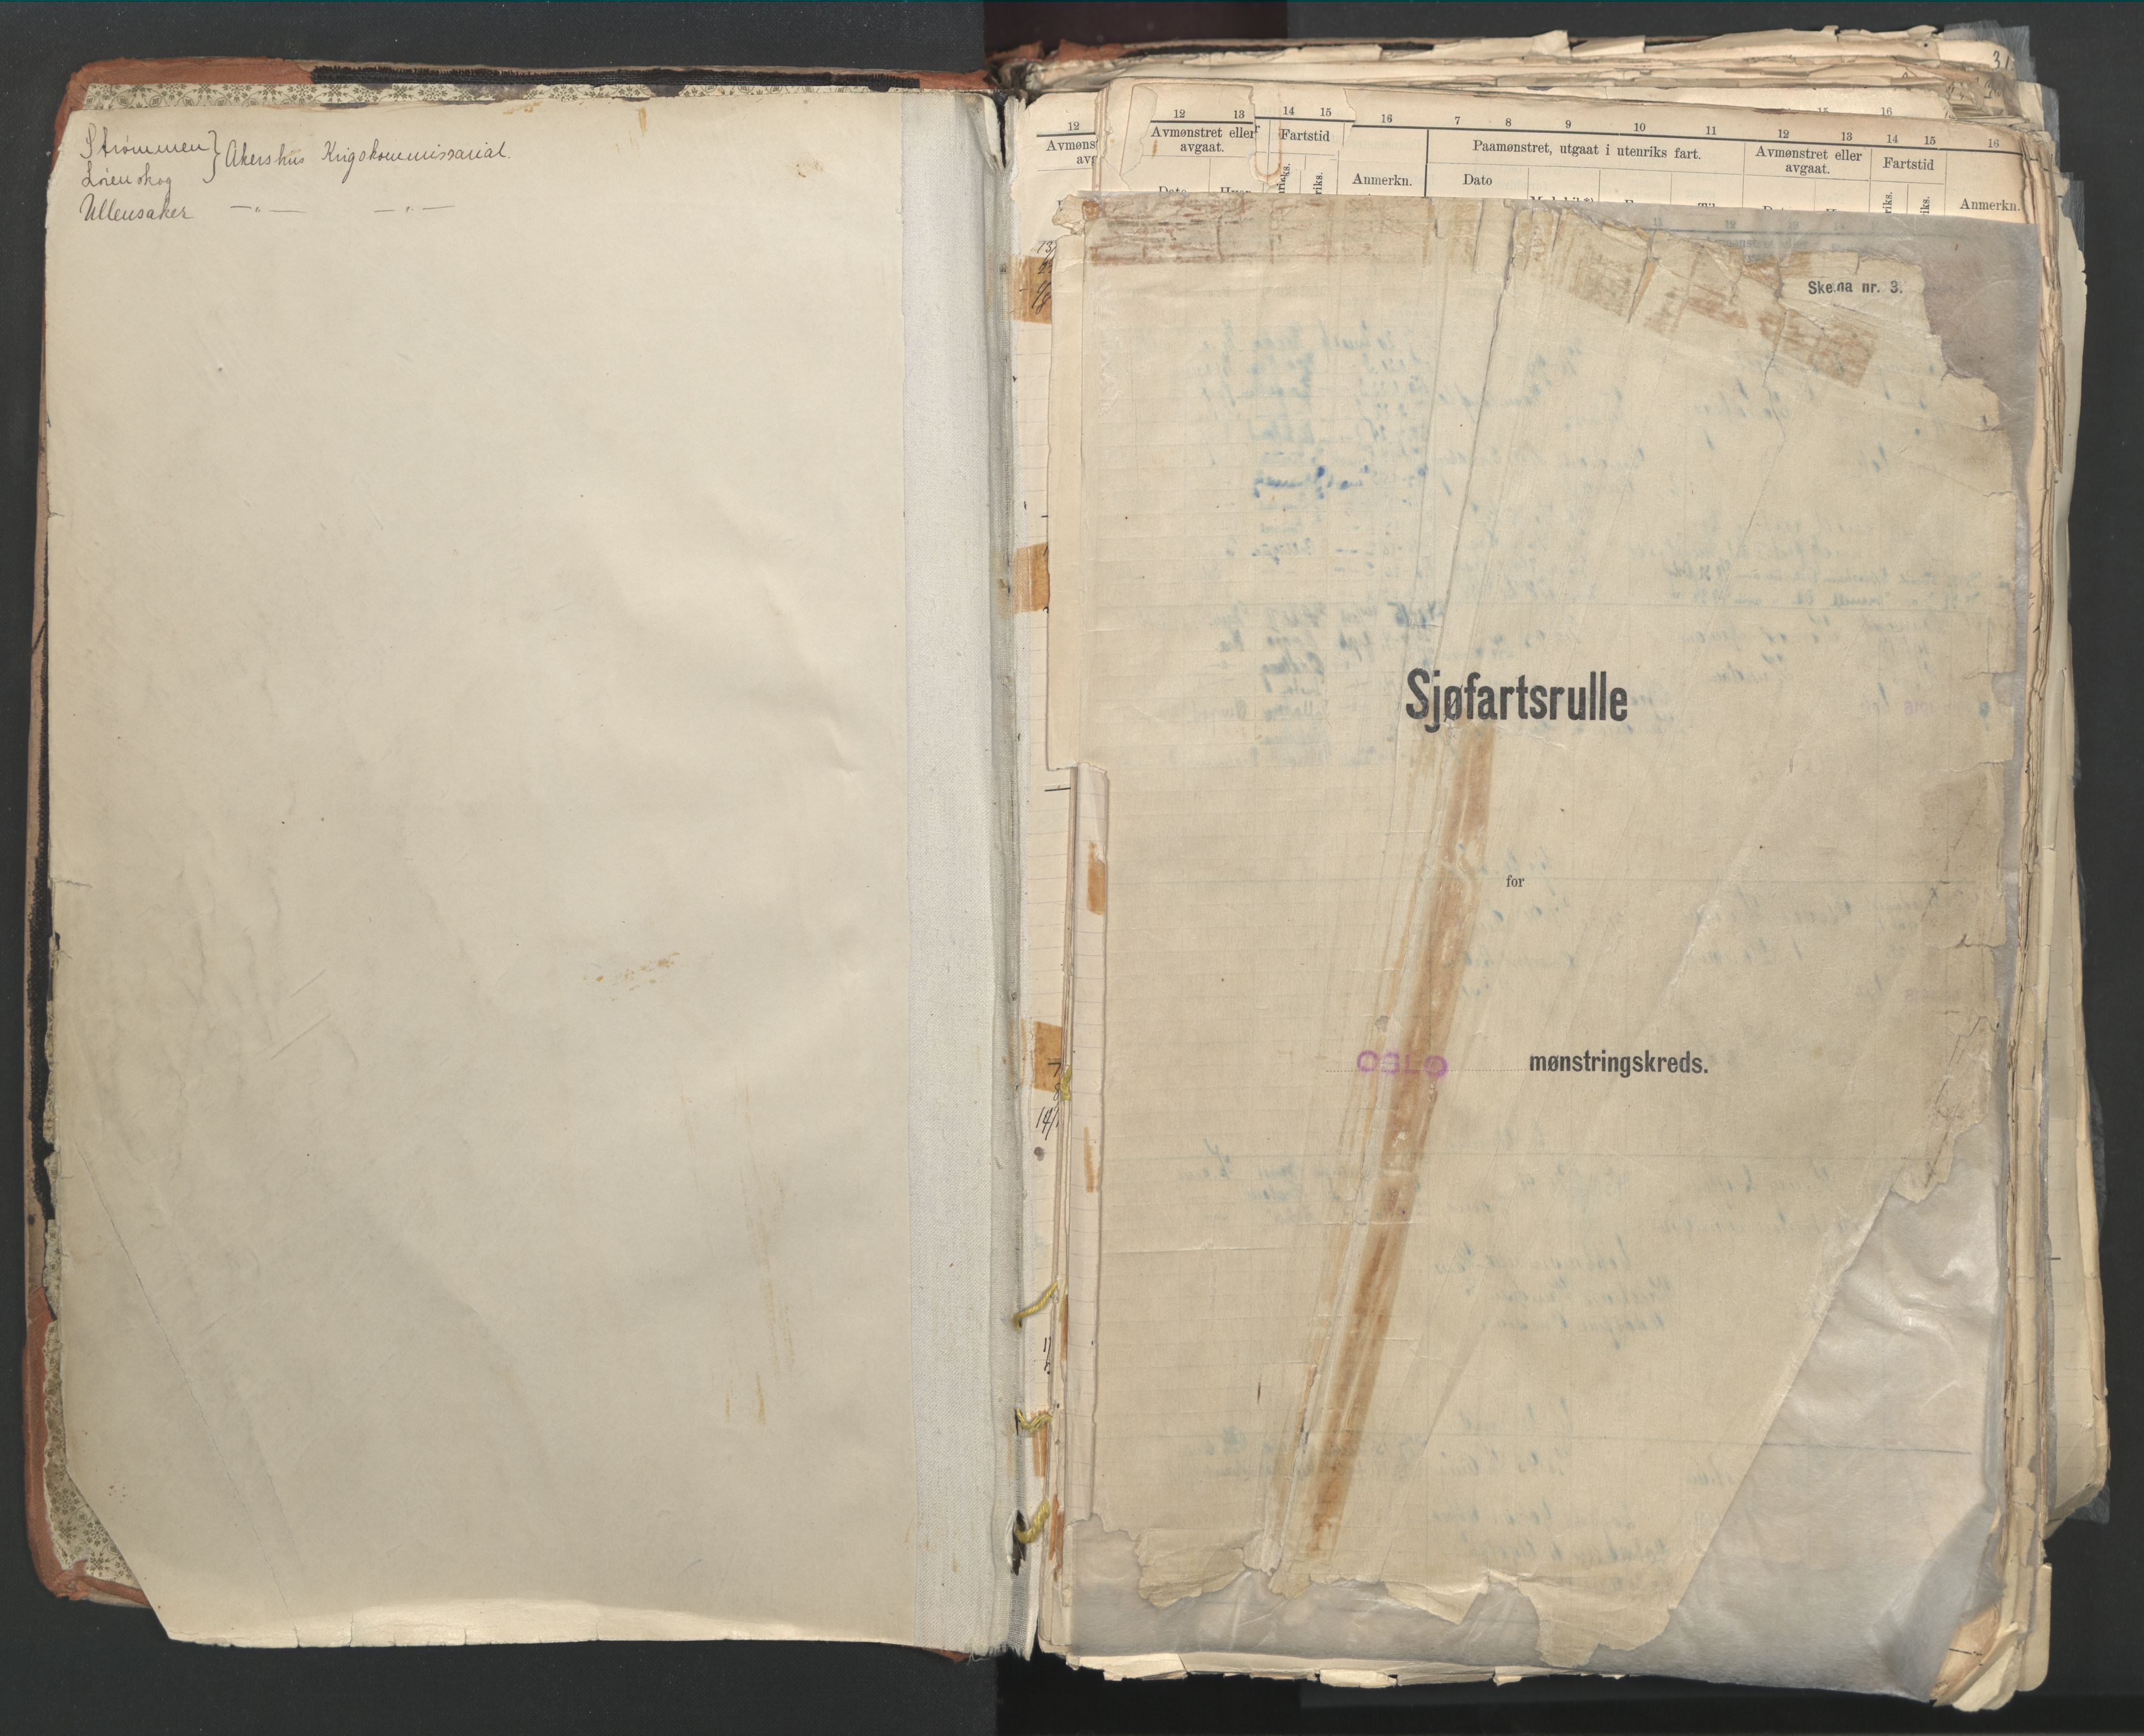 SAO, Oslo sjømannskontor, F/Fd/L0003: B-rulle, 1916, s. upaginert